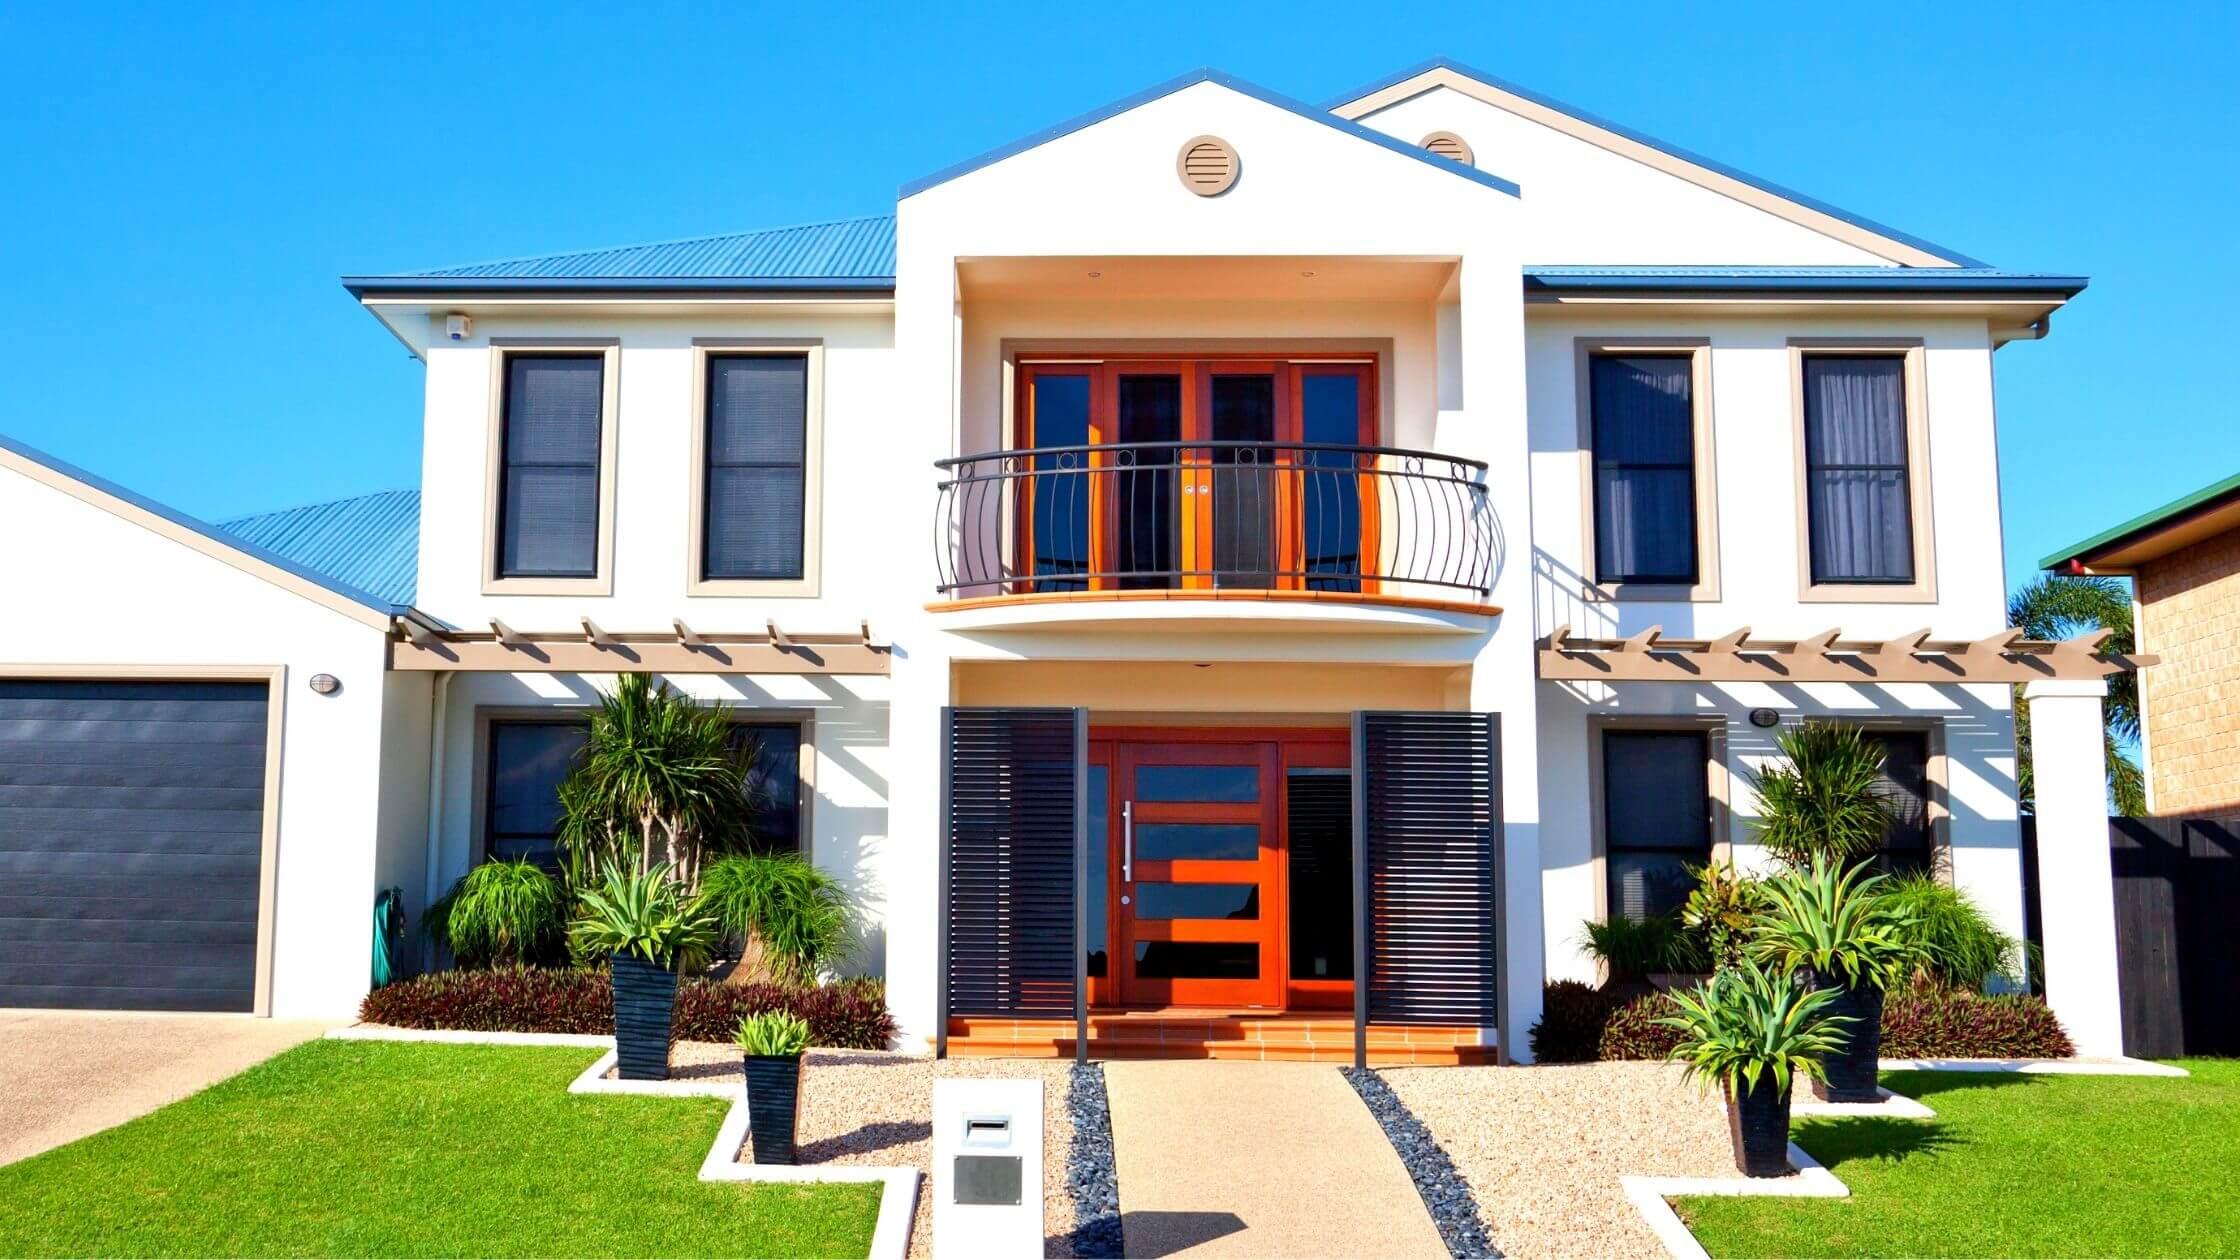 Home Design Front   Front Exterior Design Images